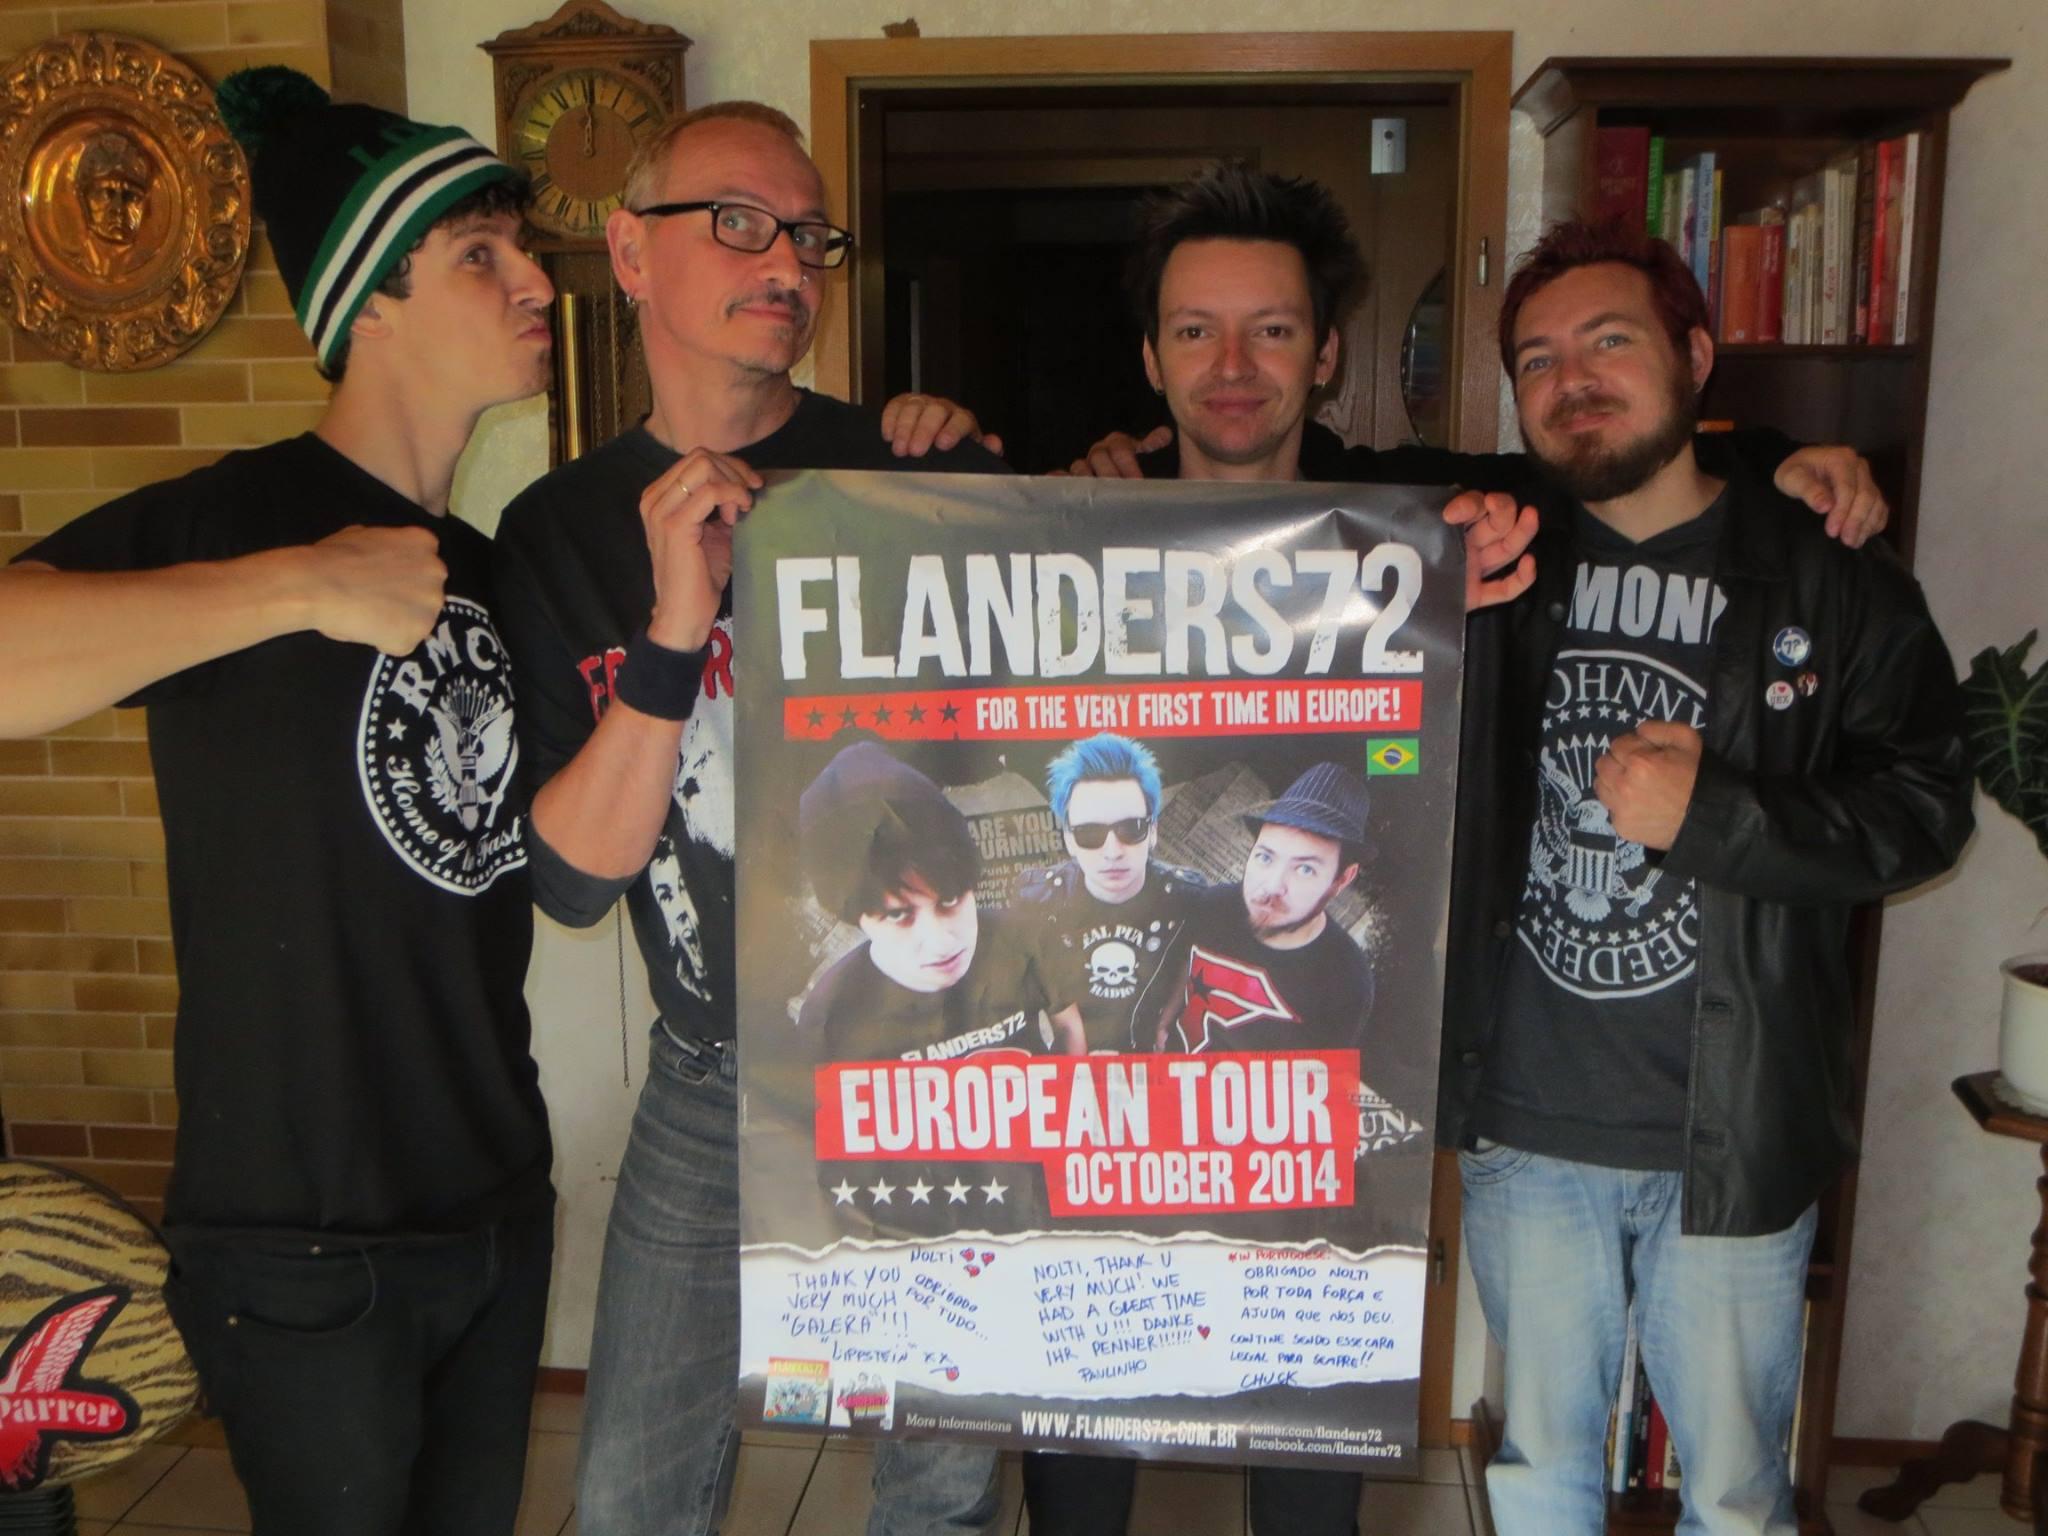 flanders_72_tour_europa (6)